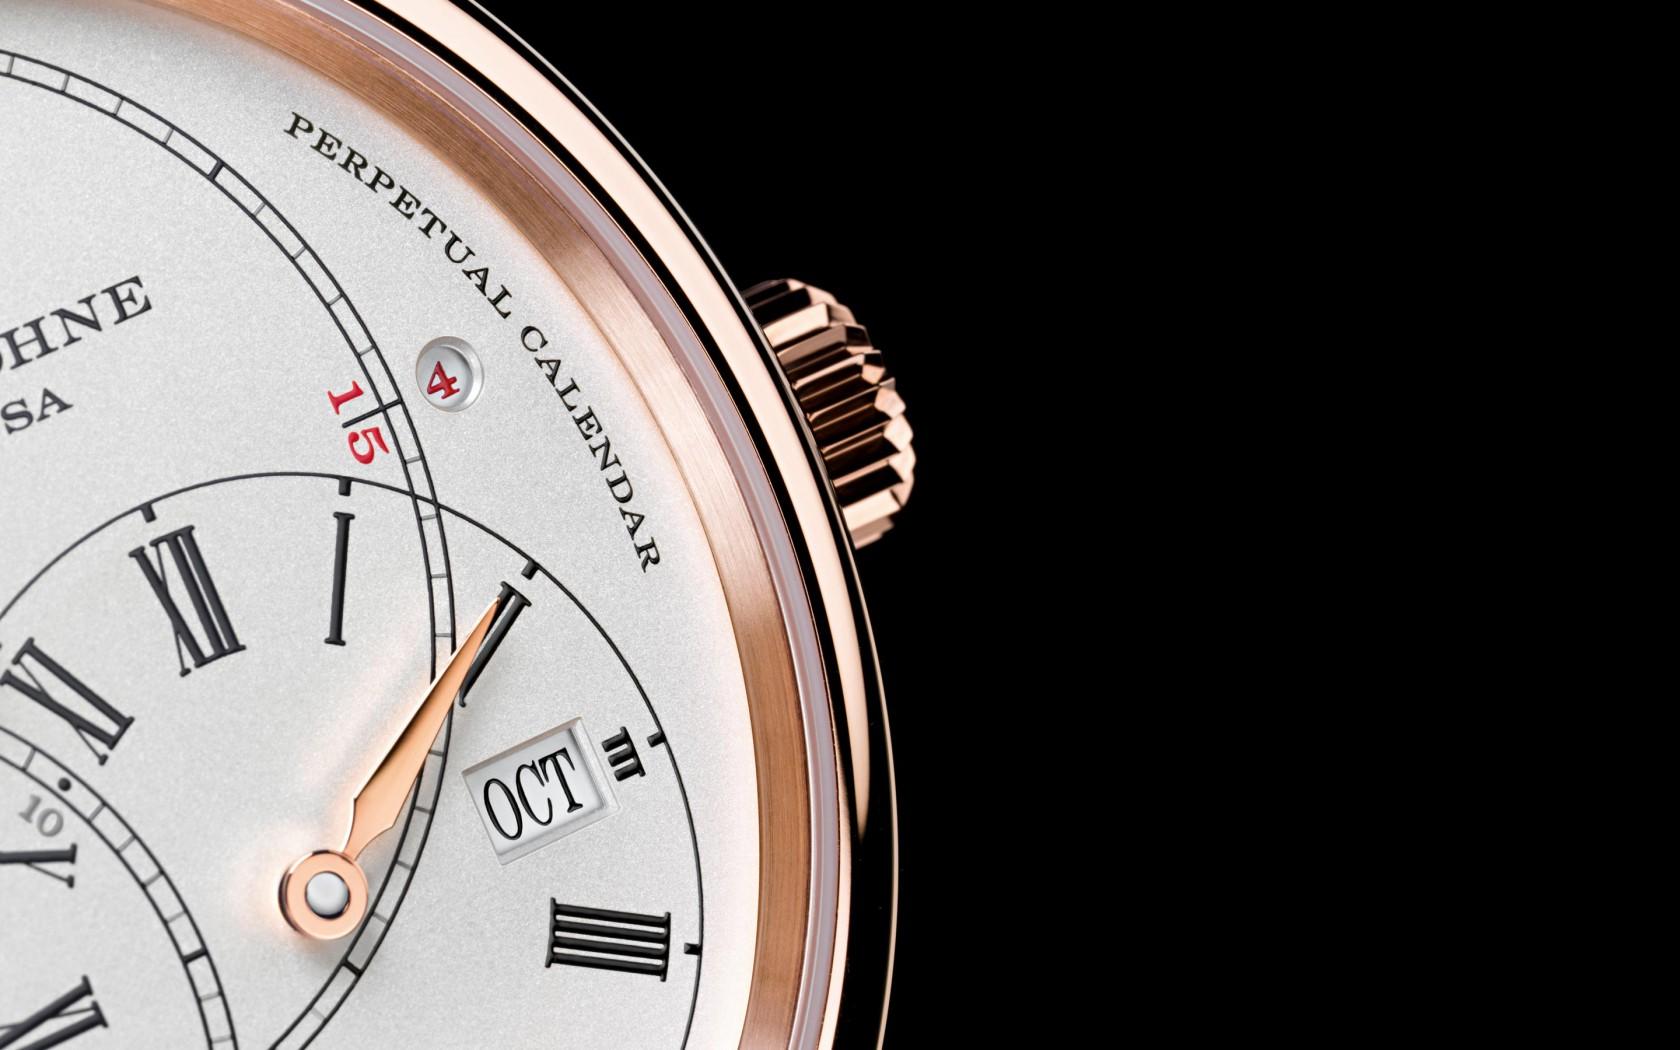 SetWidth1680-Lange-Richard-Lange-Ewiger-Kalender-Terraluna-Perpetual-Calendar-Rotgold-pink-gold-180032-B2